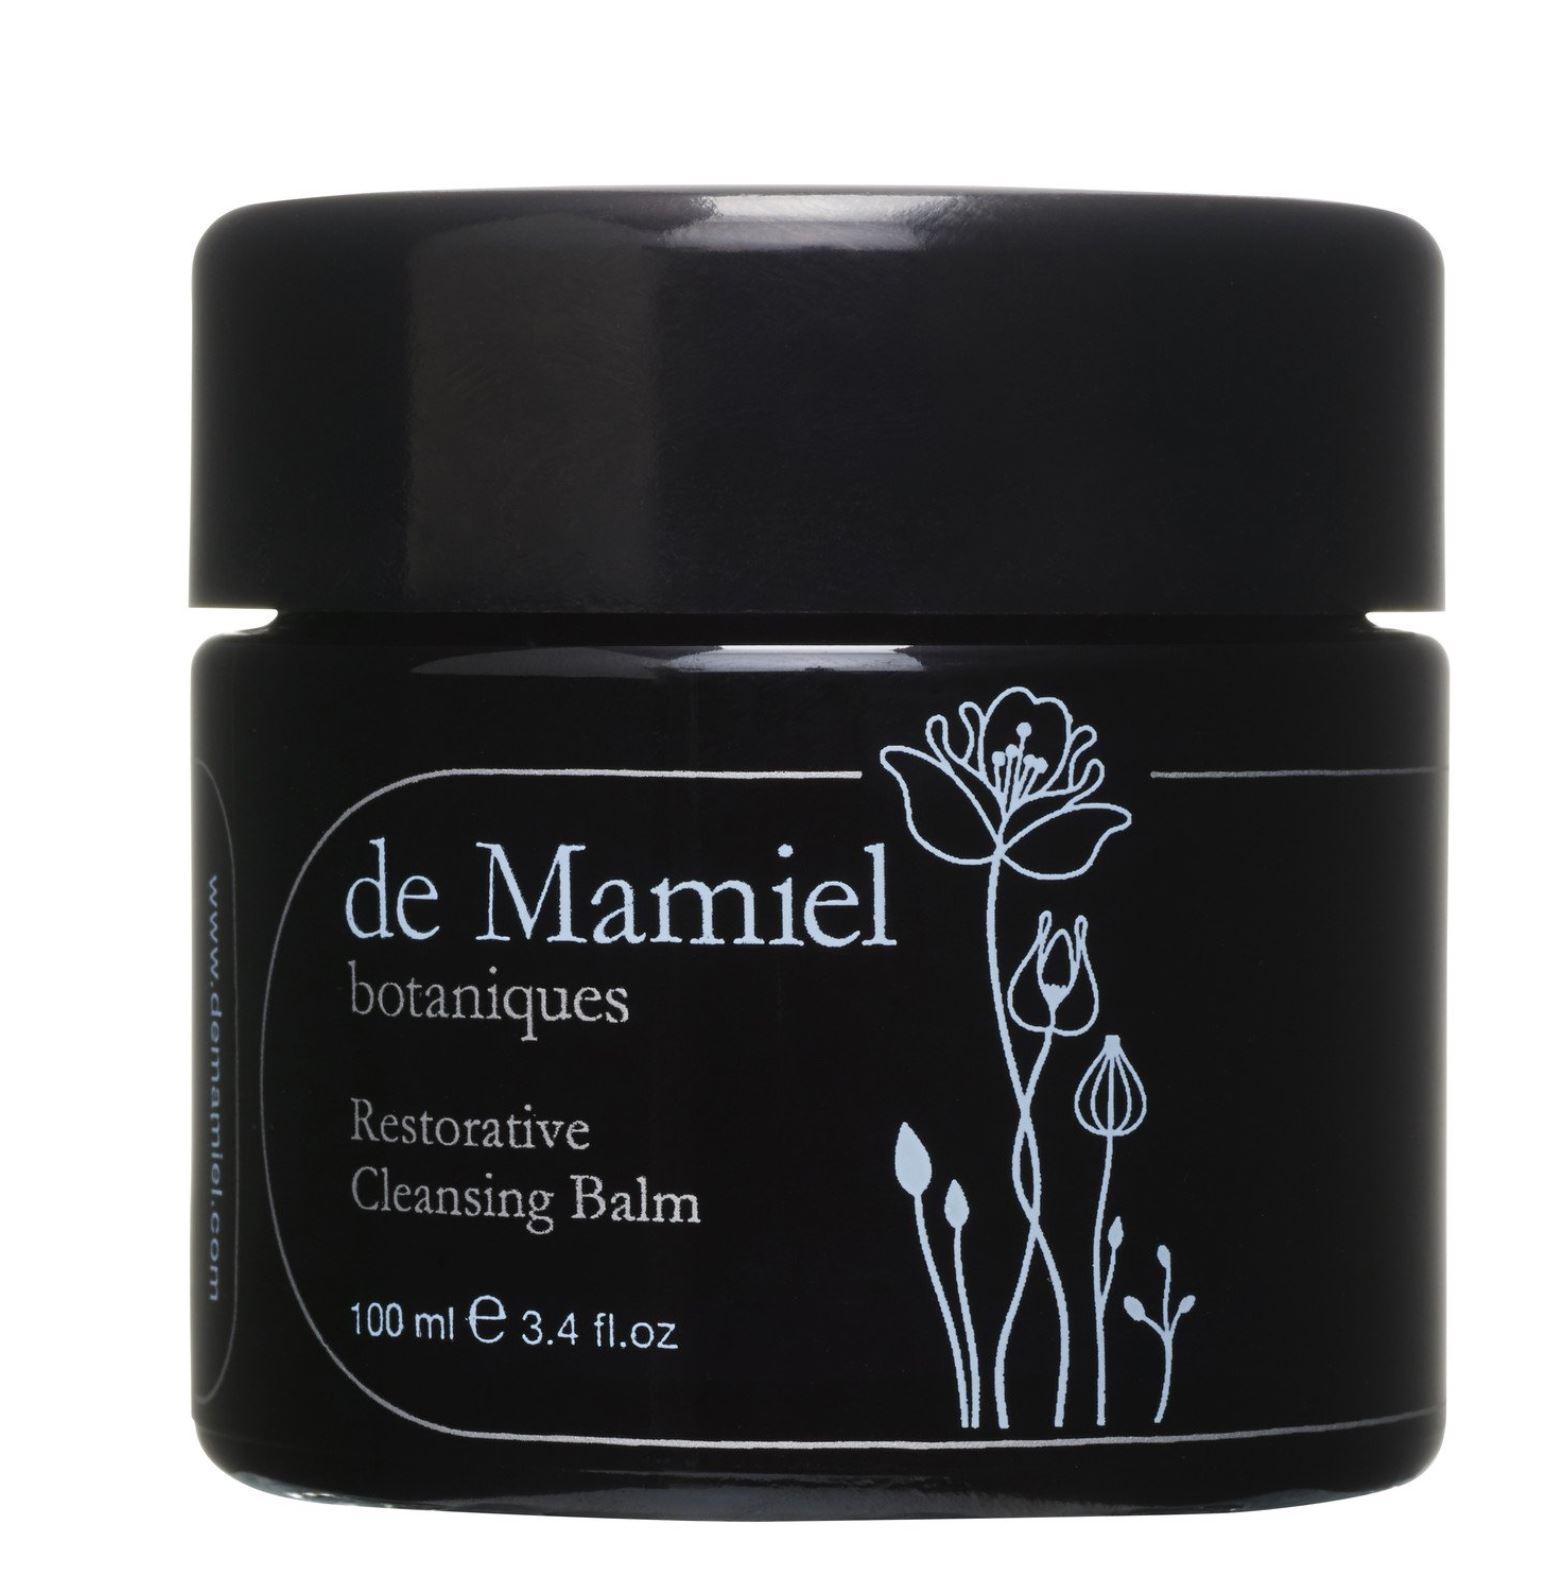 DE MAMIEL: RESTORATIVE CLEANSING BALM